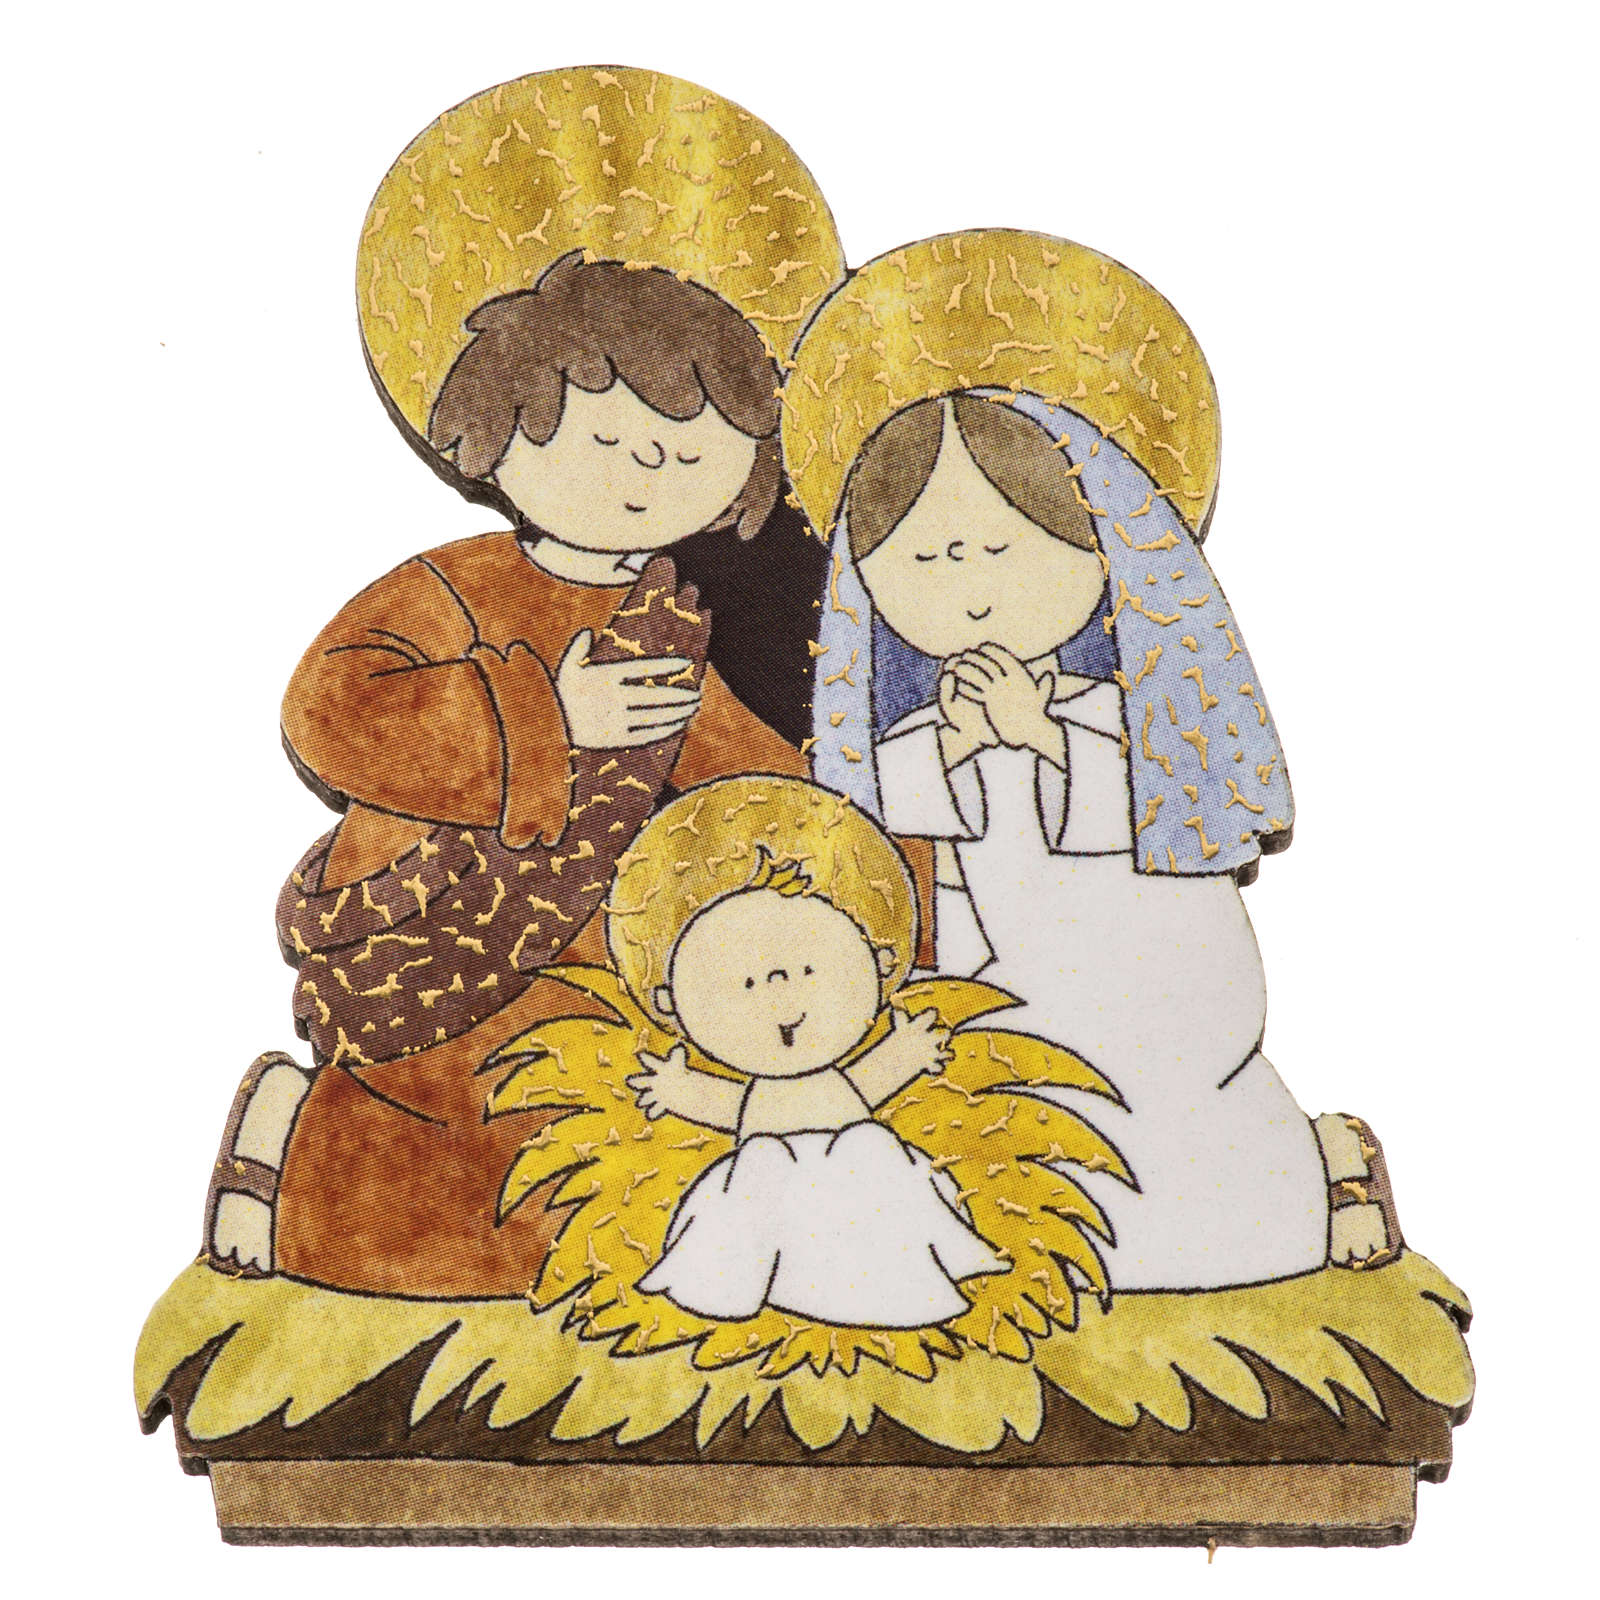 Calamita legno Sacra Famiglia 3